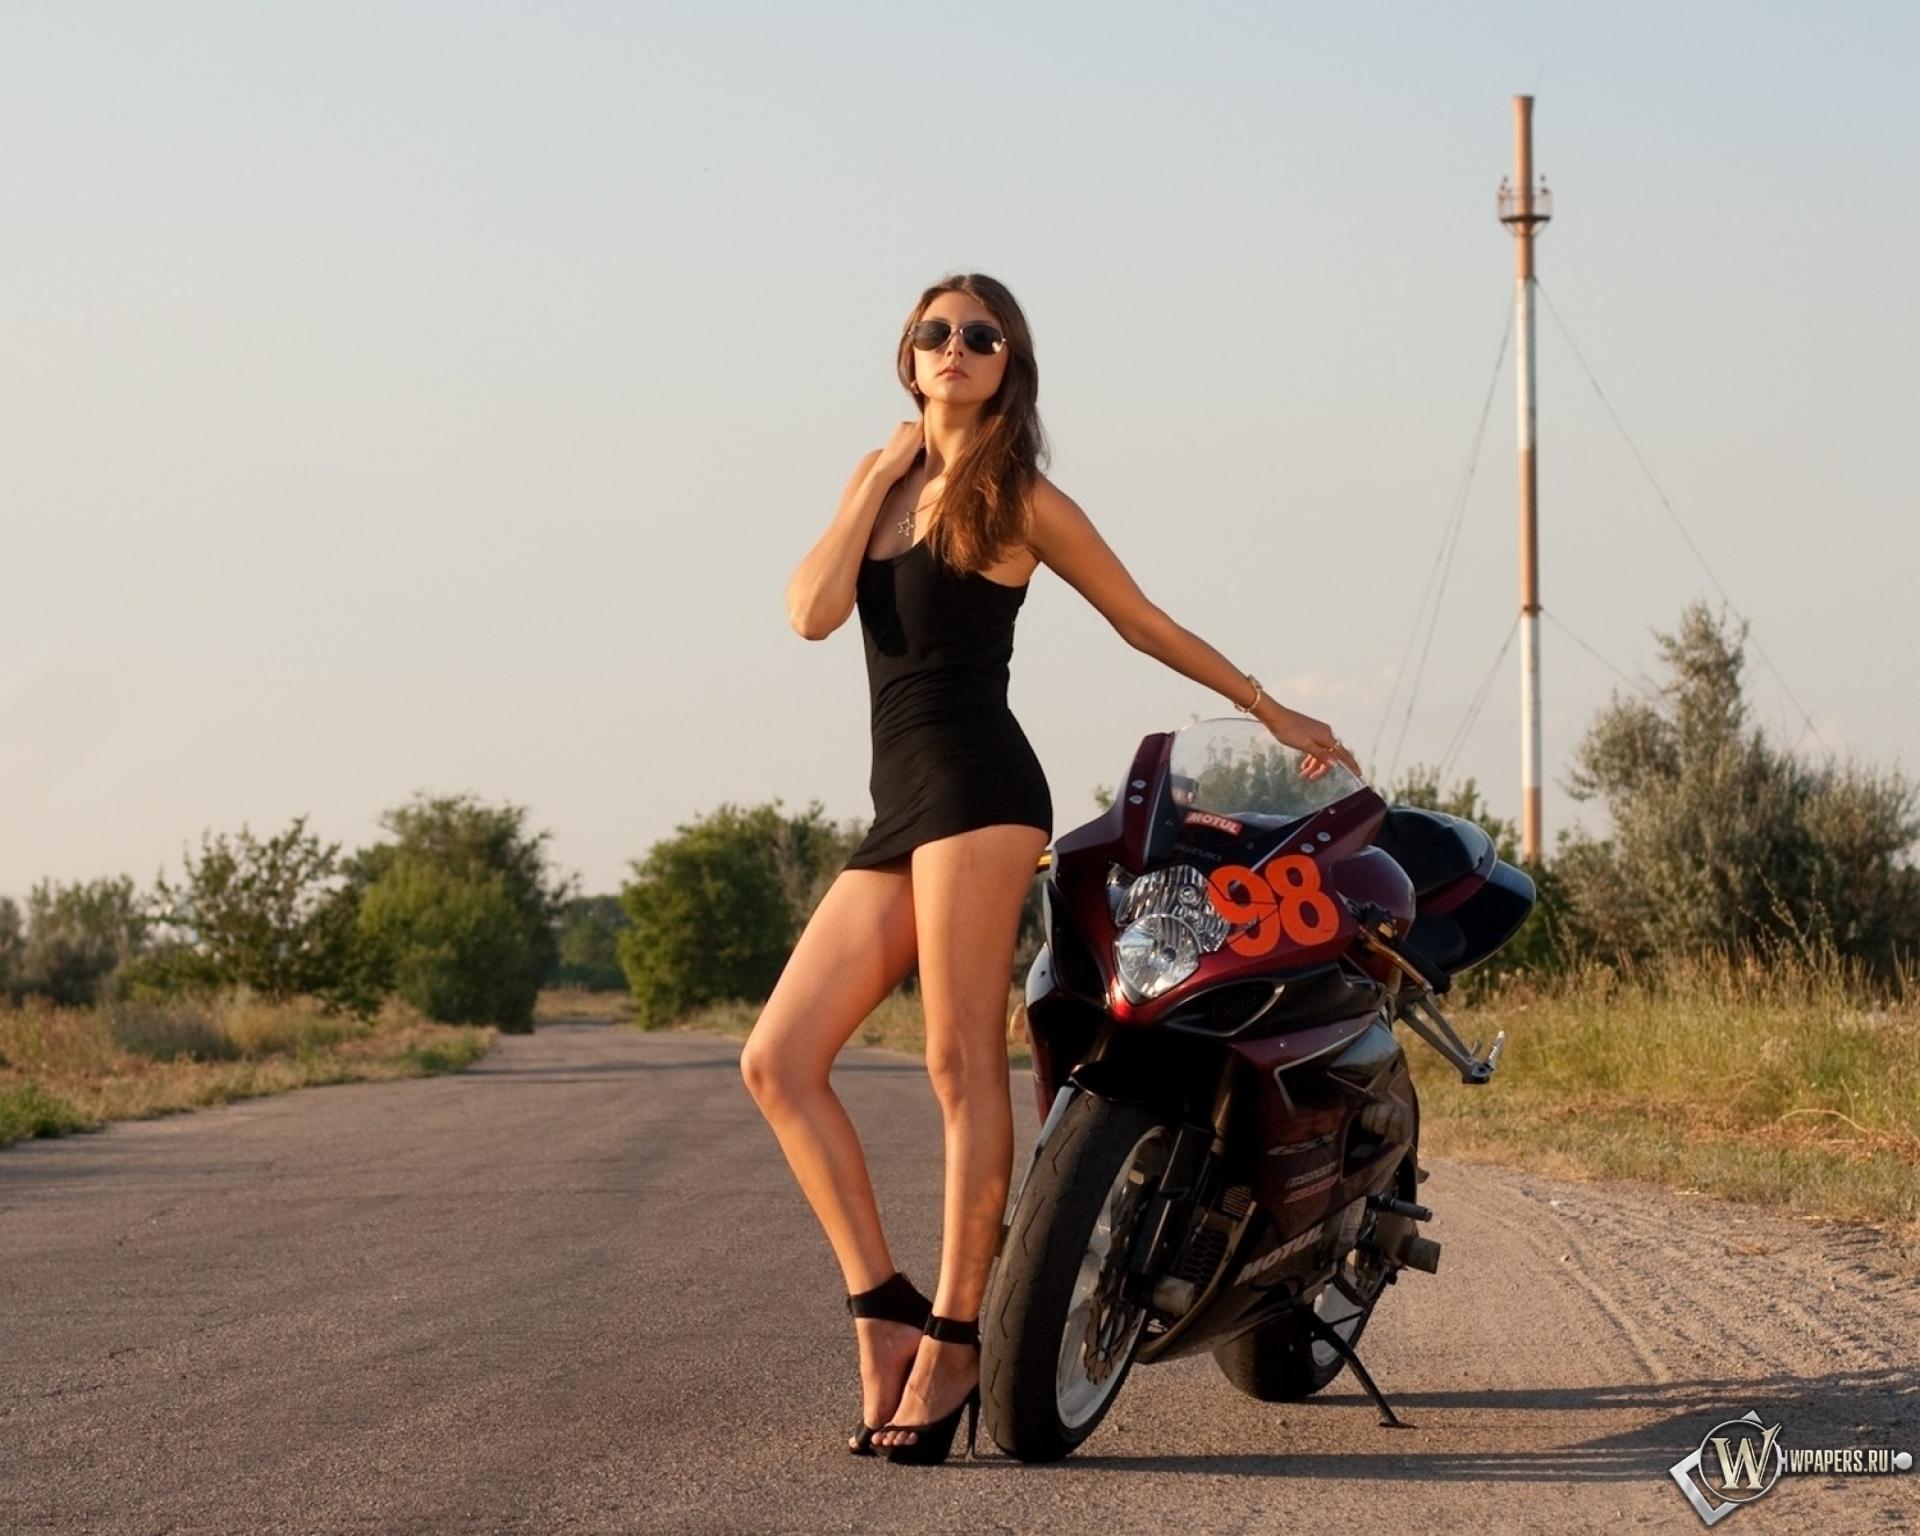 Девушка с мотоциклом 1920x1536